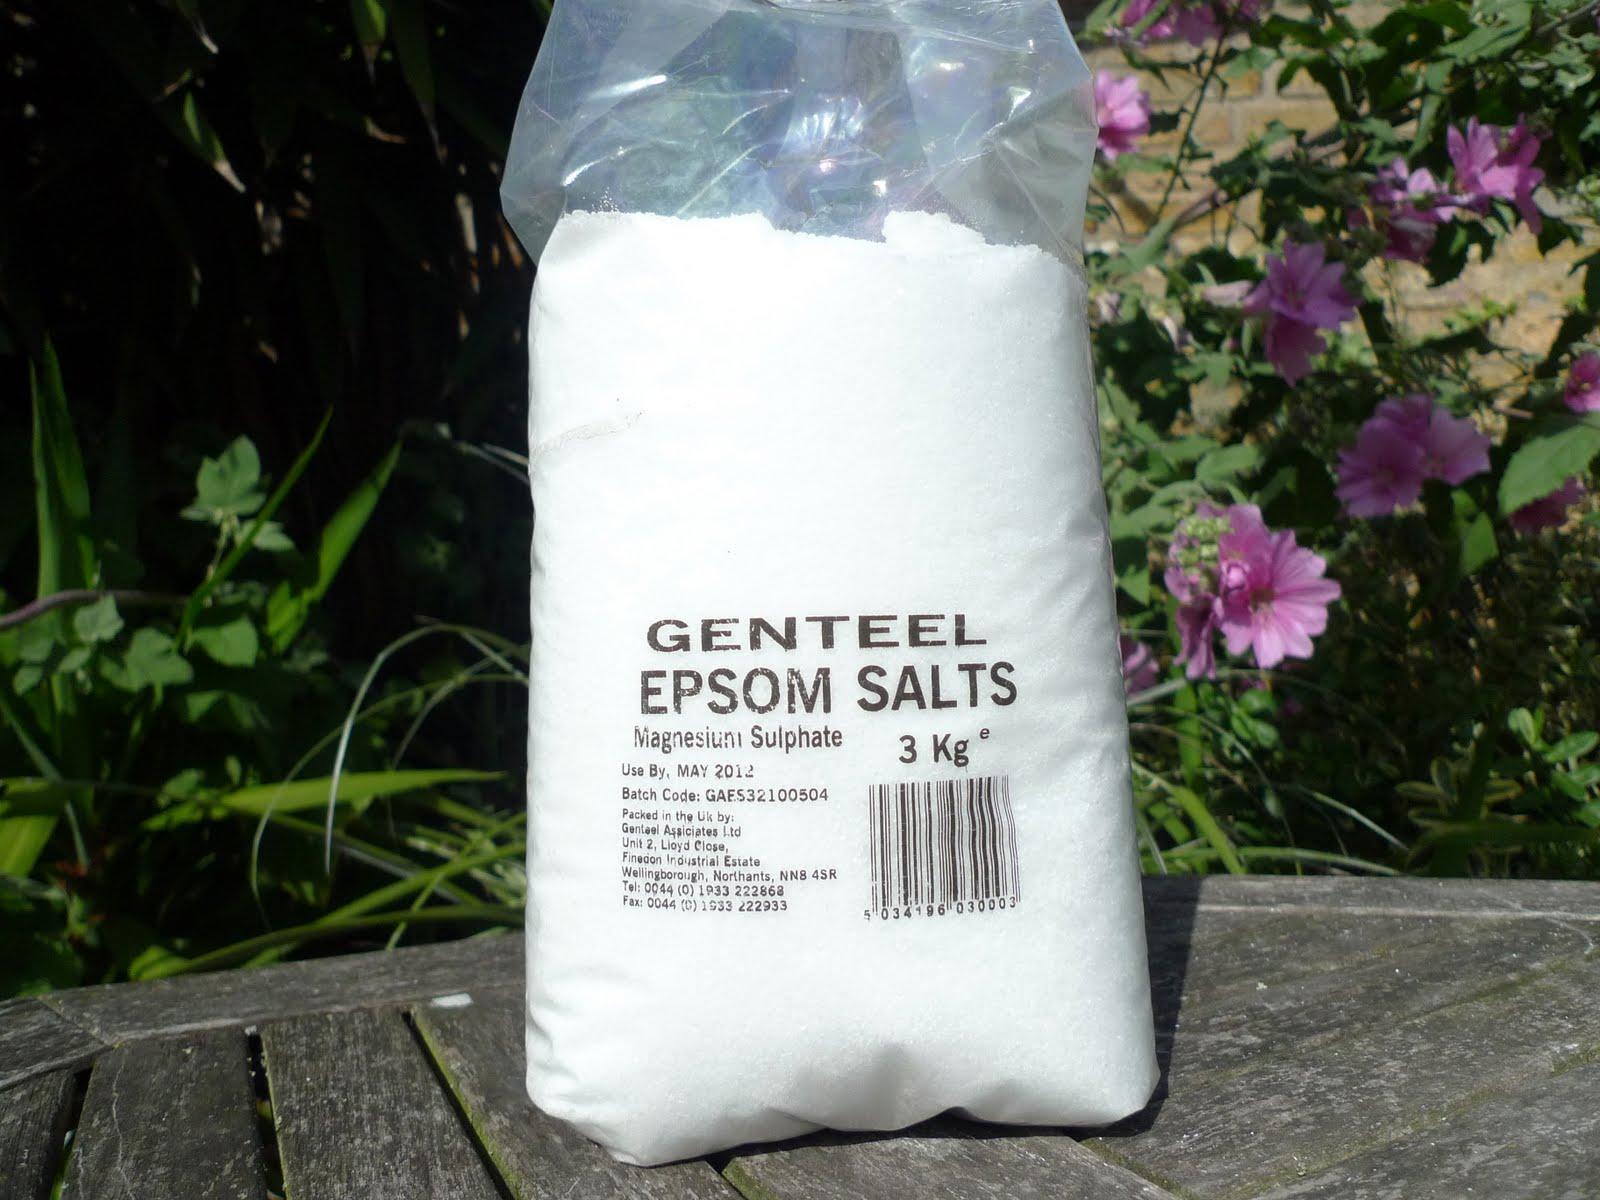 epsom salt for gardening. I Recently Lugged Home This 3kg Bag Of Epsom Salts From The Garden Pharmacy In Covent (where It Costs £6 For Huge Bag). Salt Gardening